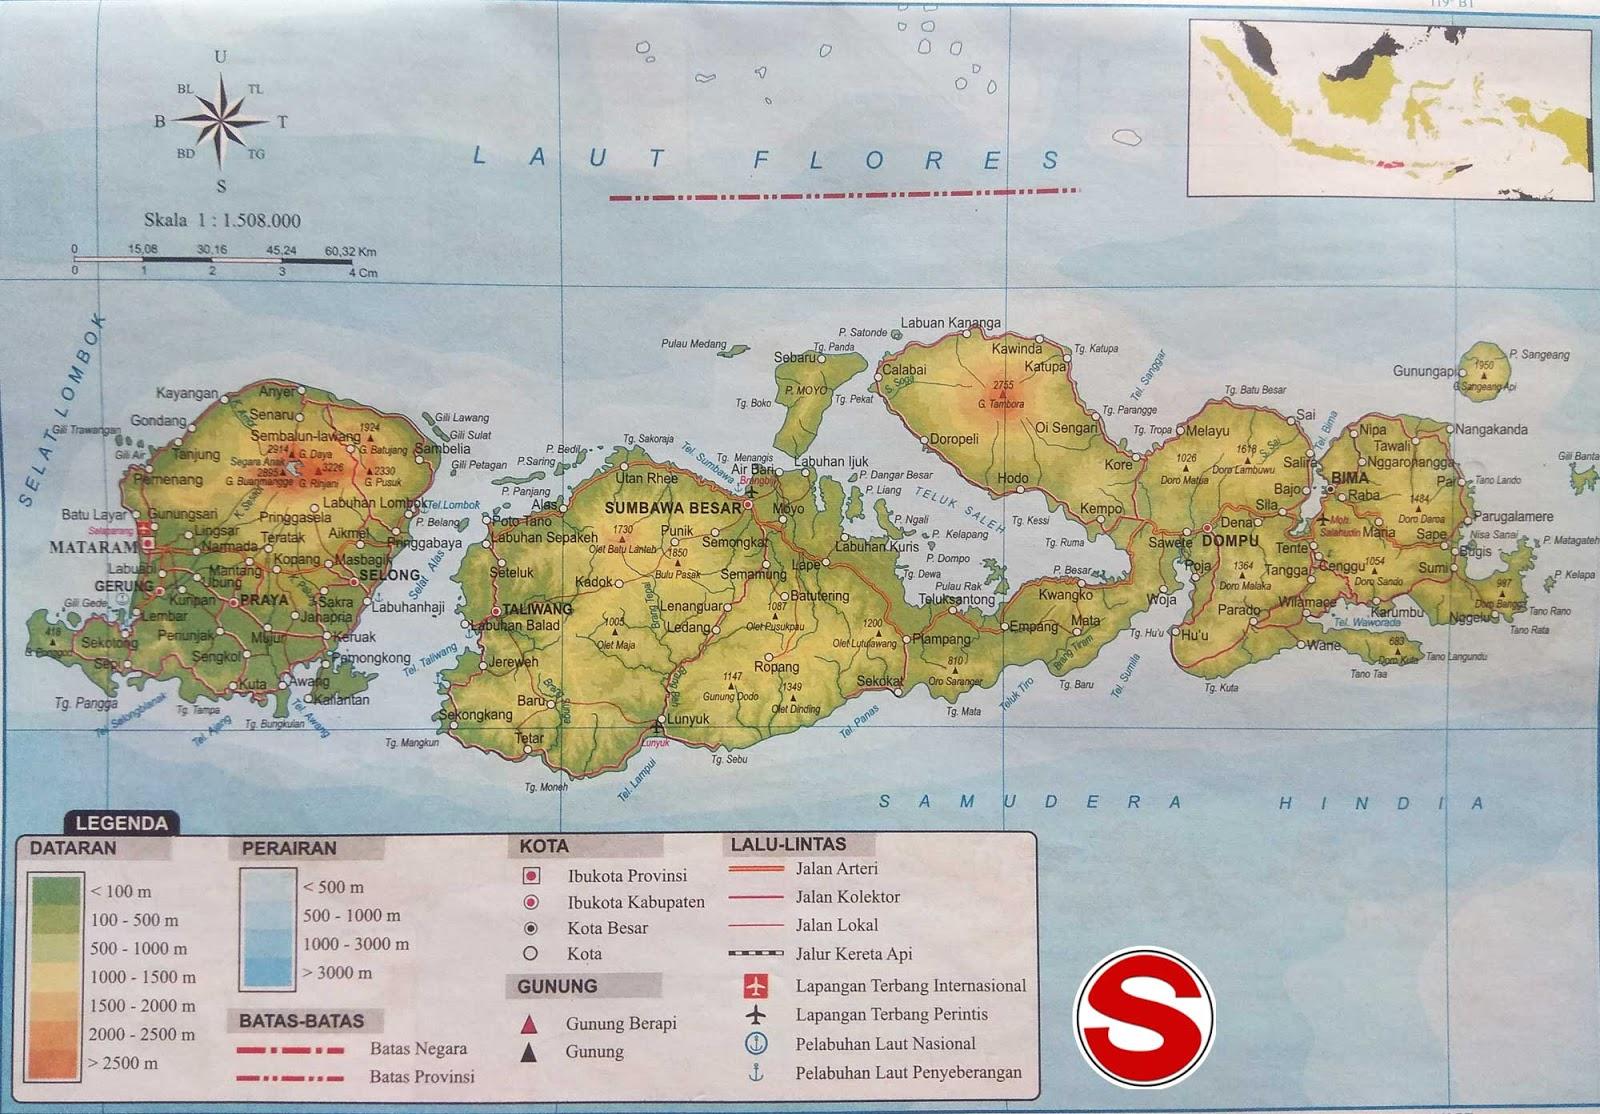 image: Peta atlas Nusa Tenggara Barat